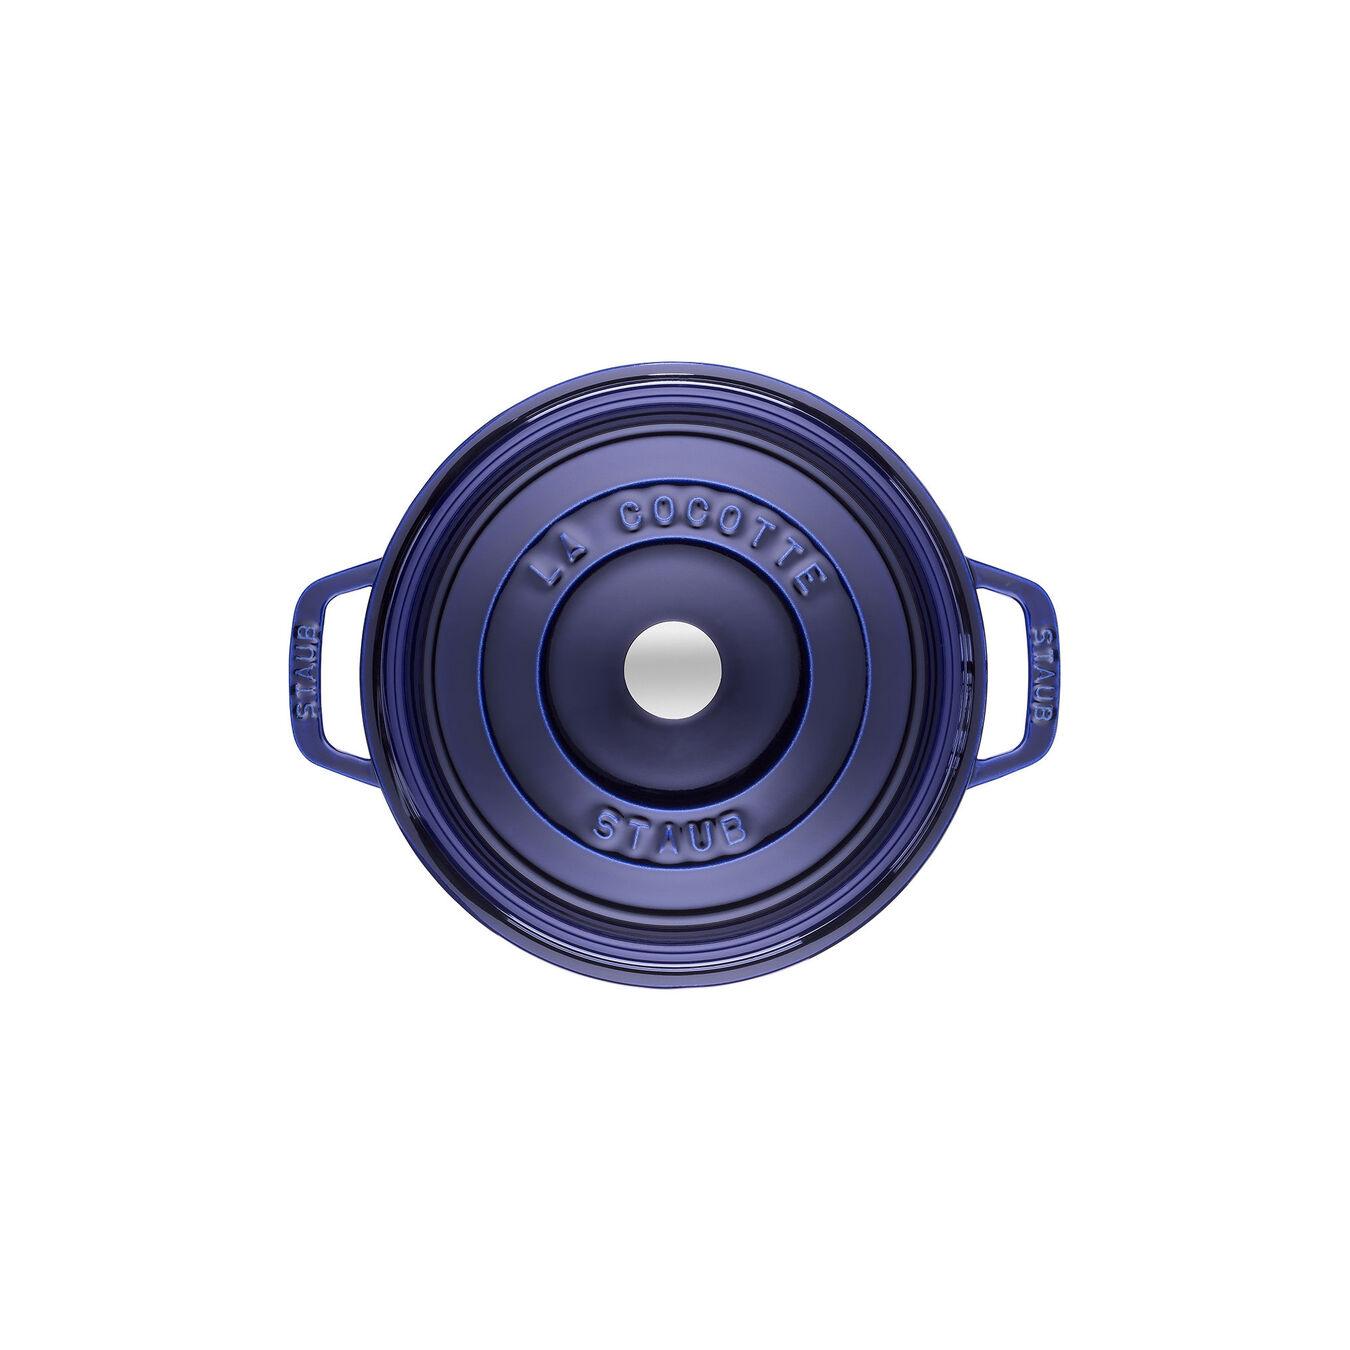 2.75-qt Round Cocotte - Dark Blue,,large 2